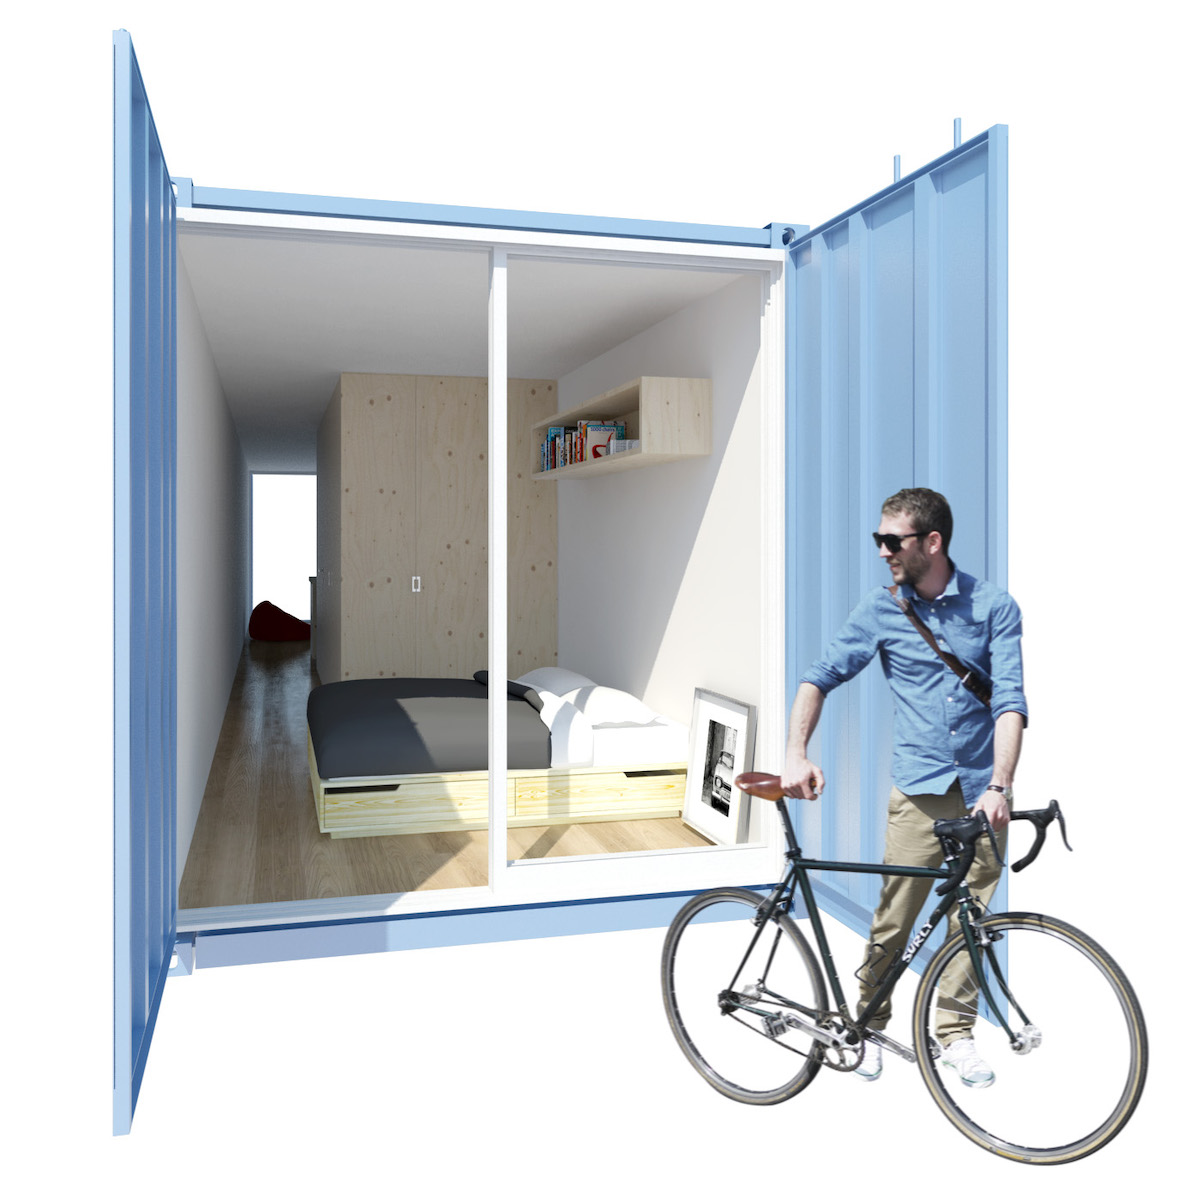 exterior dormitorio containers